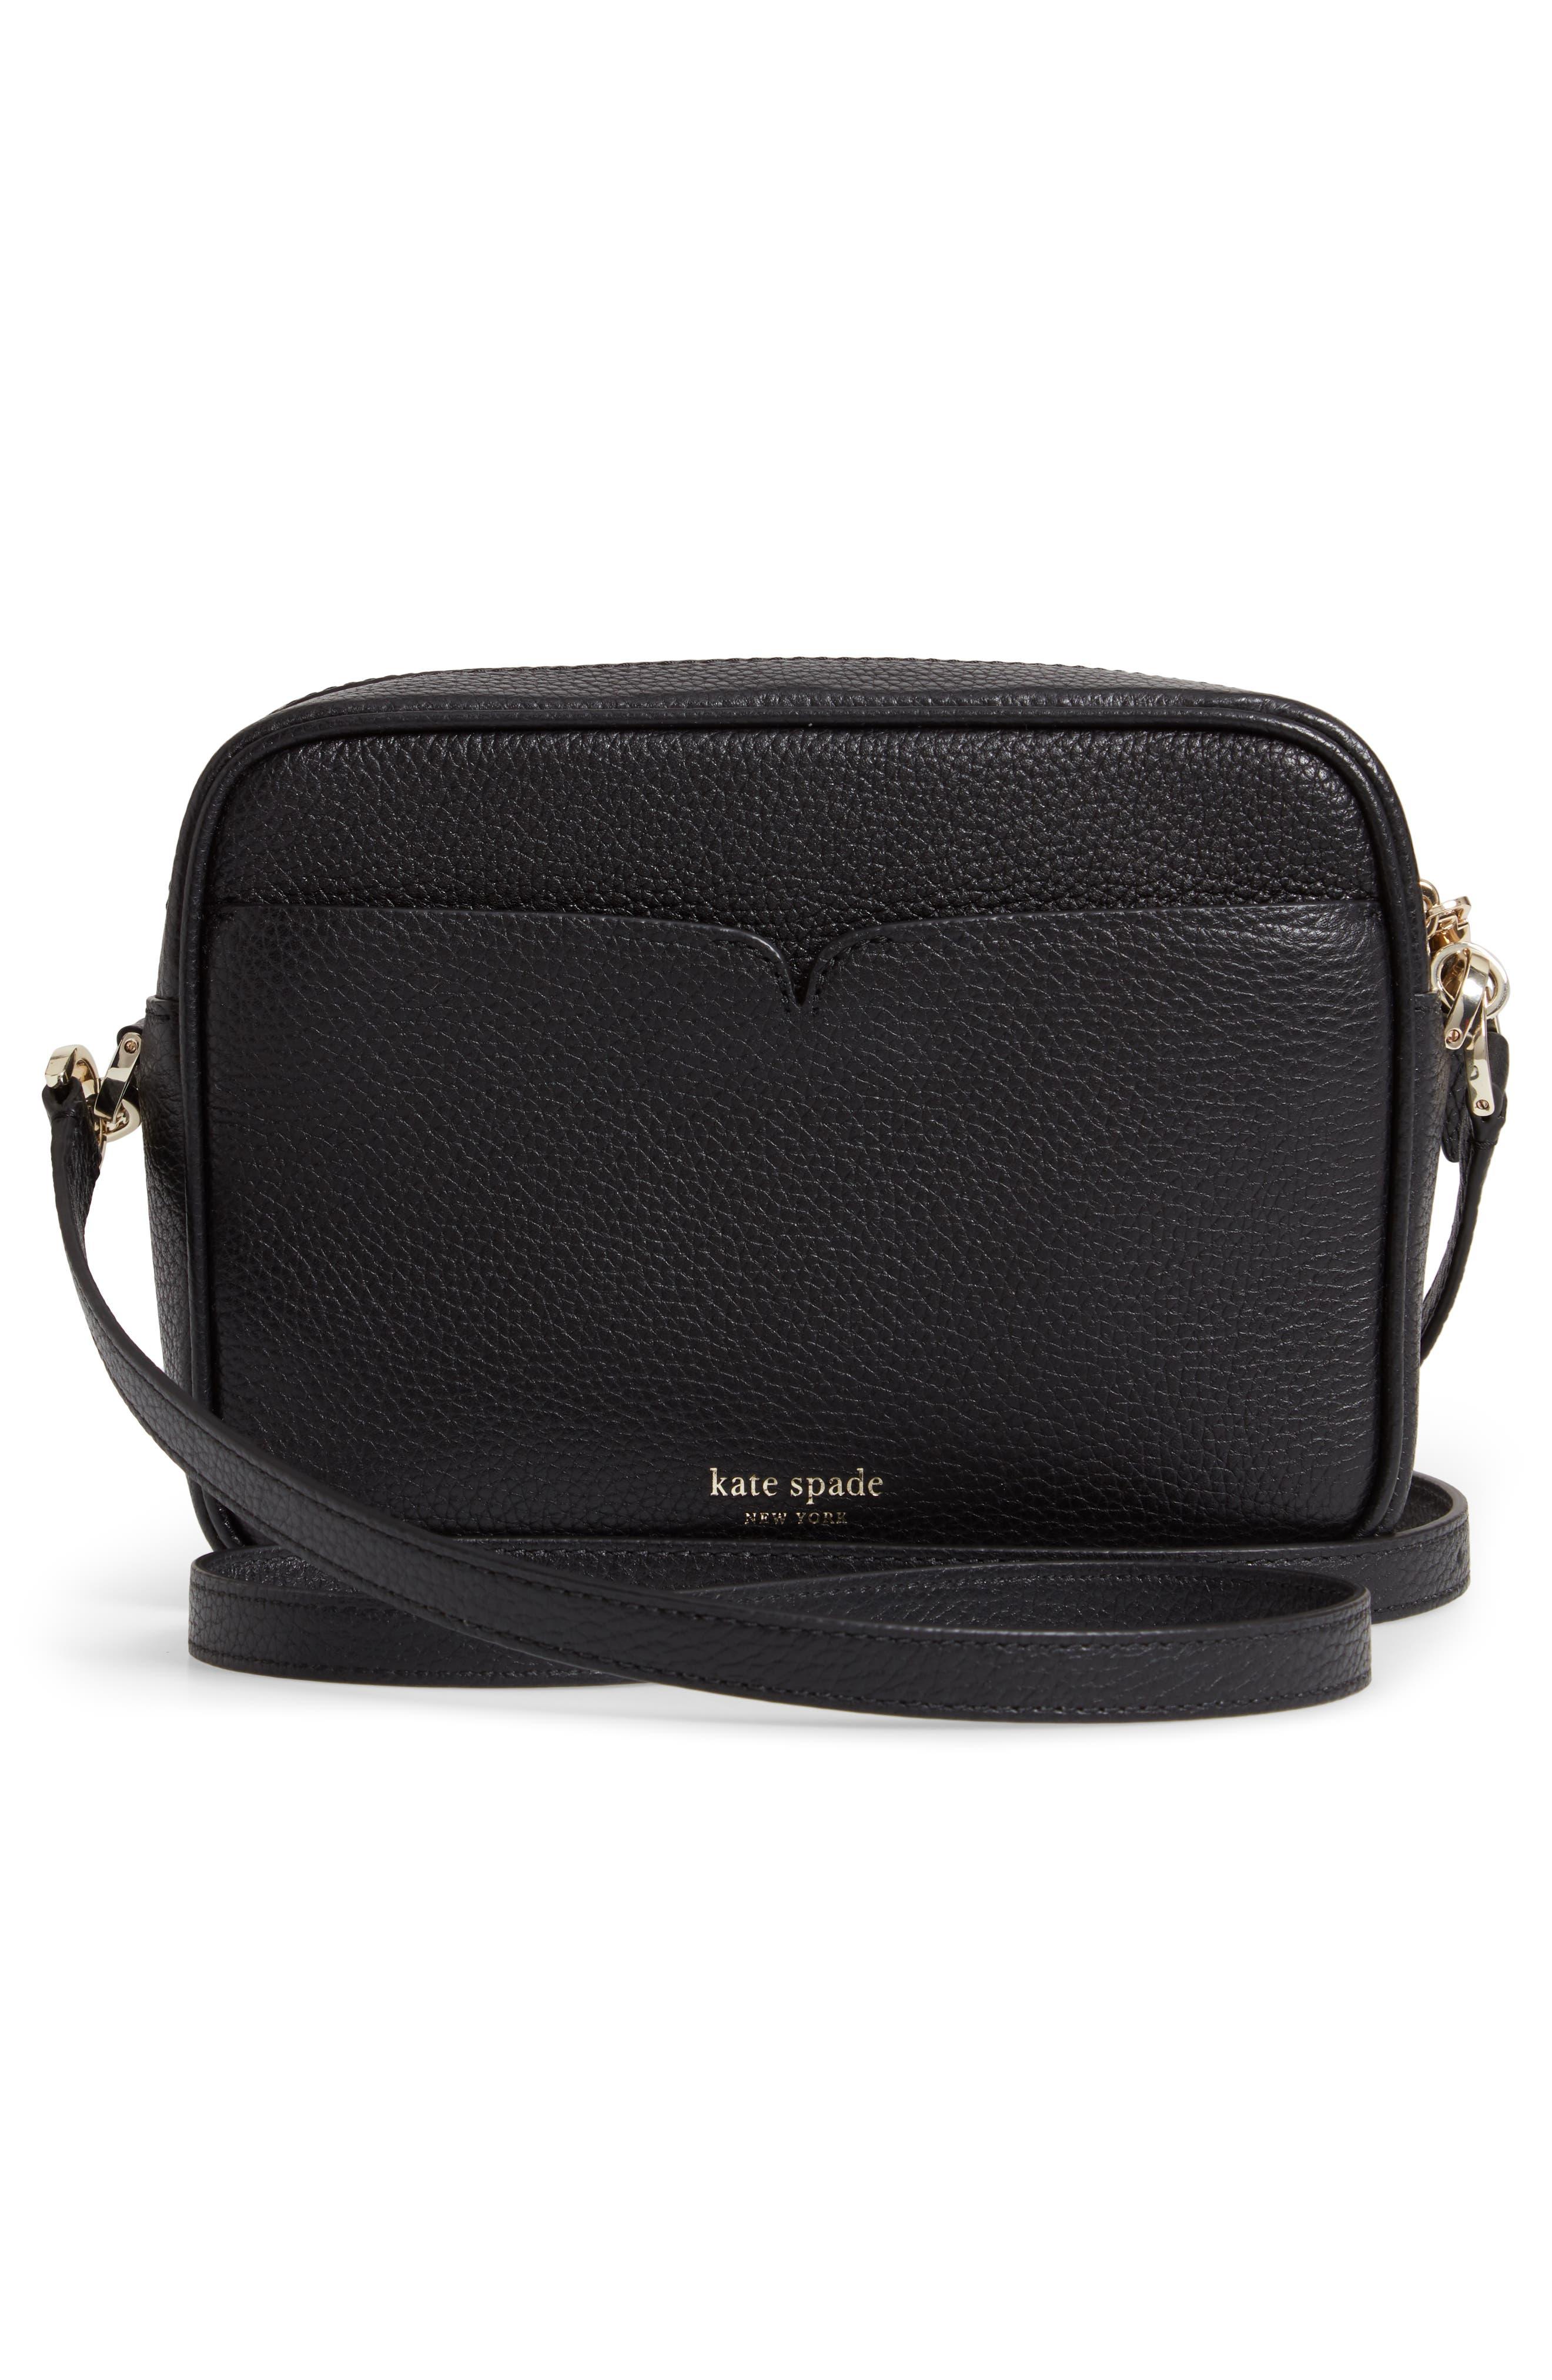 KATE SPADE NEW YORK, medium polly leather camera bag, Alternate thumbnail 4, color, BLACK